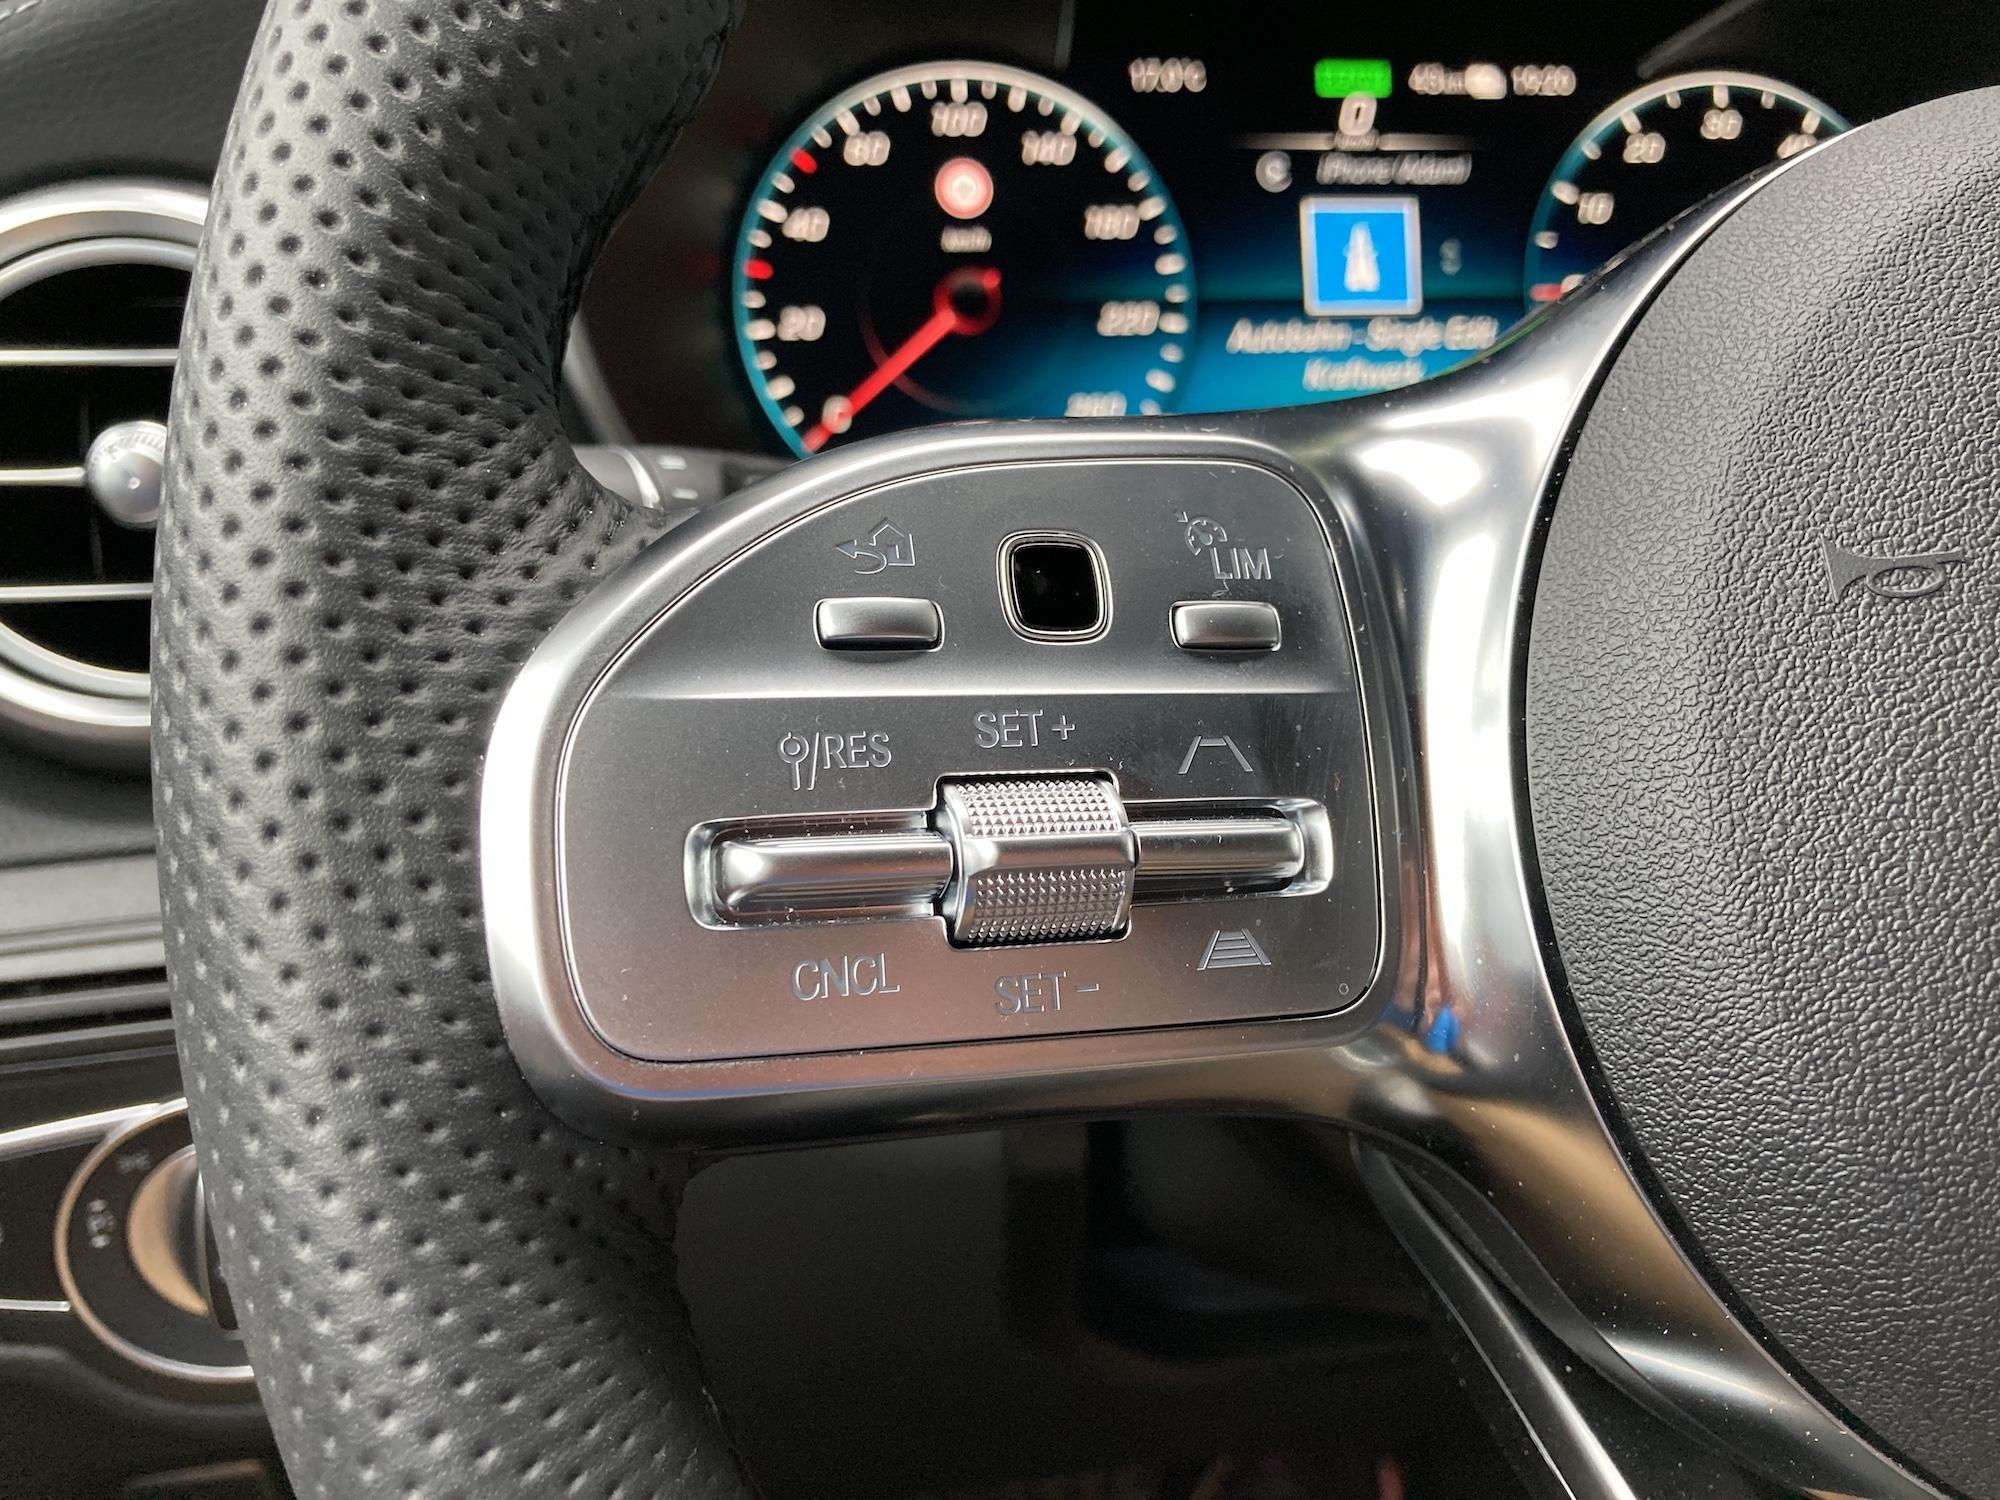 Mercedes GLC audio